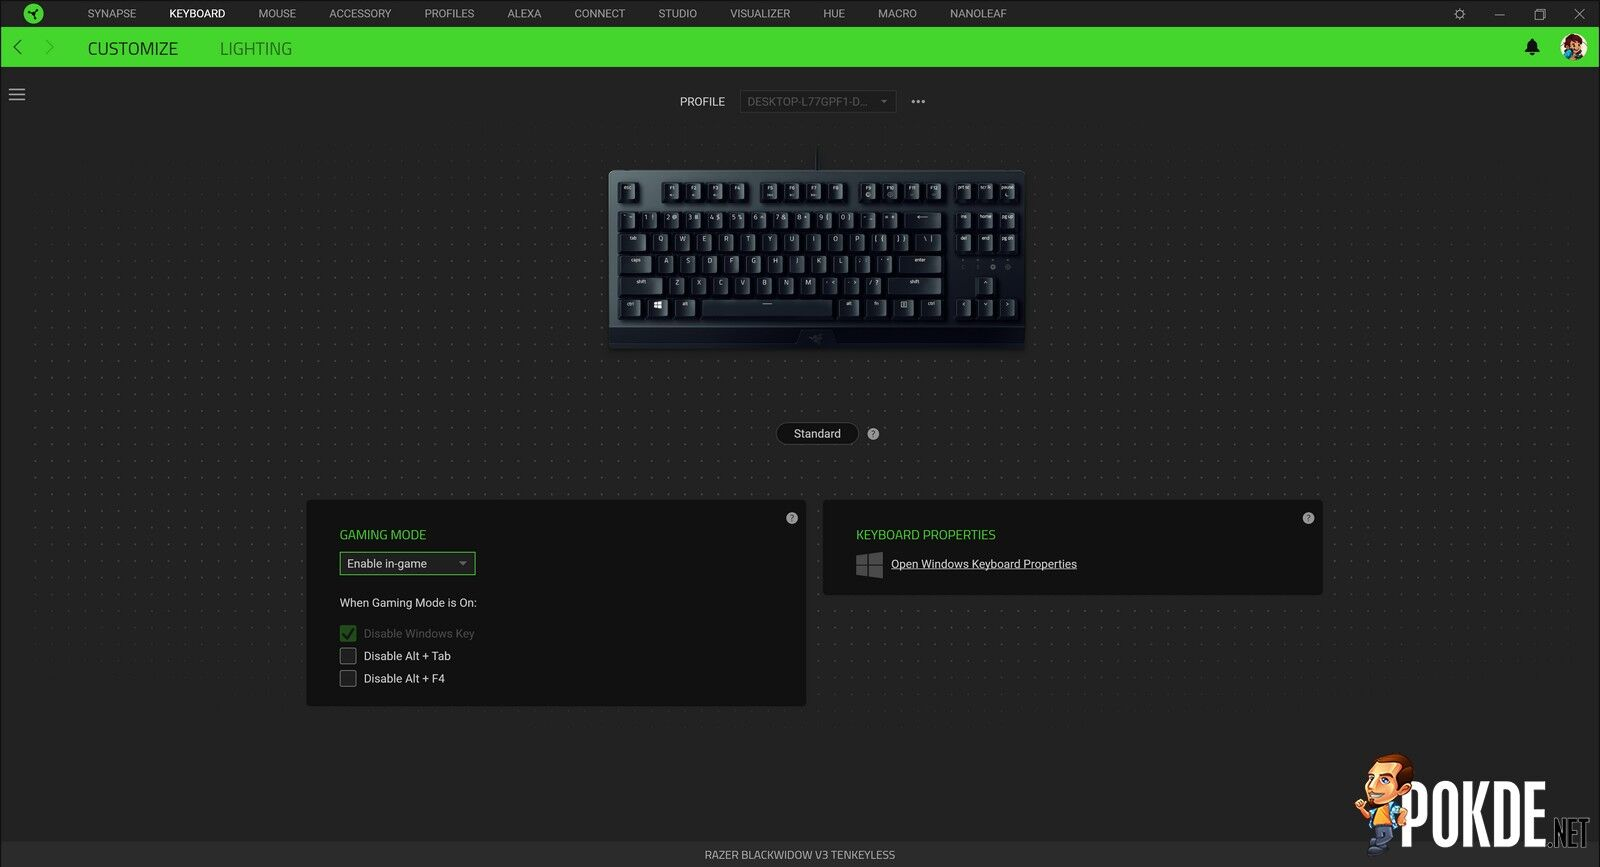 Razer BlackWidow V3 TKL Review - Simplicity Can Be a Pricey Key 26